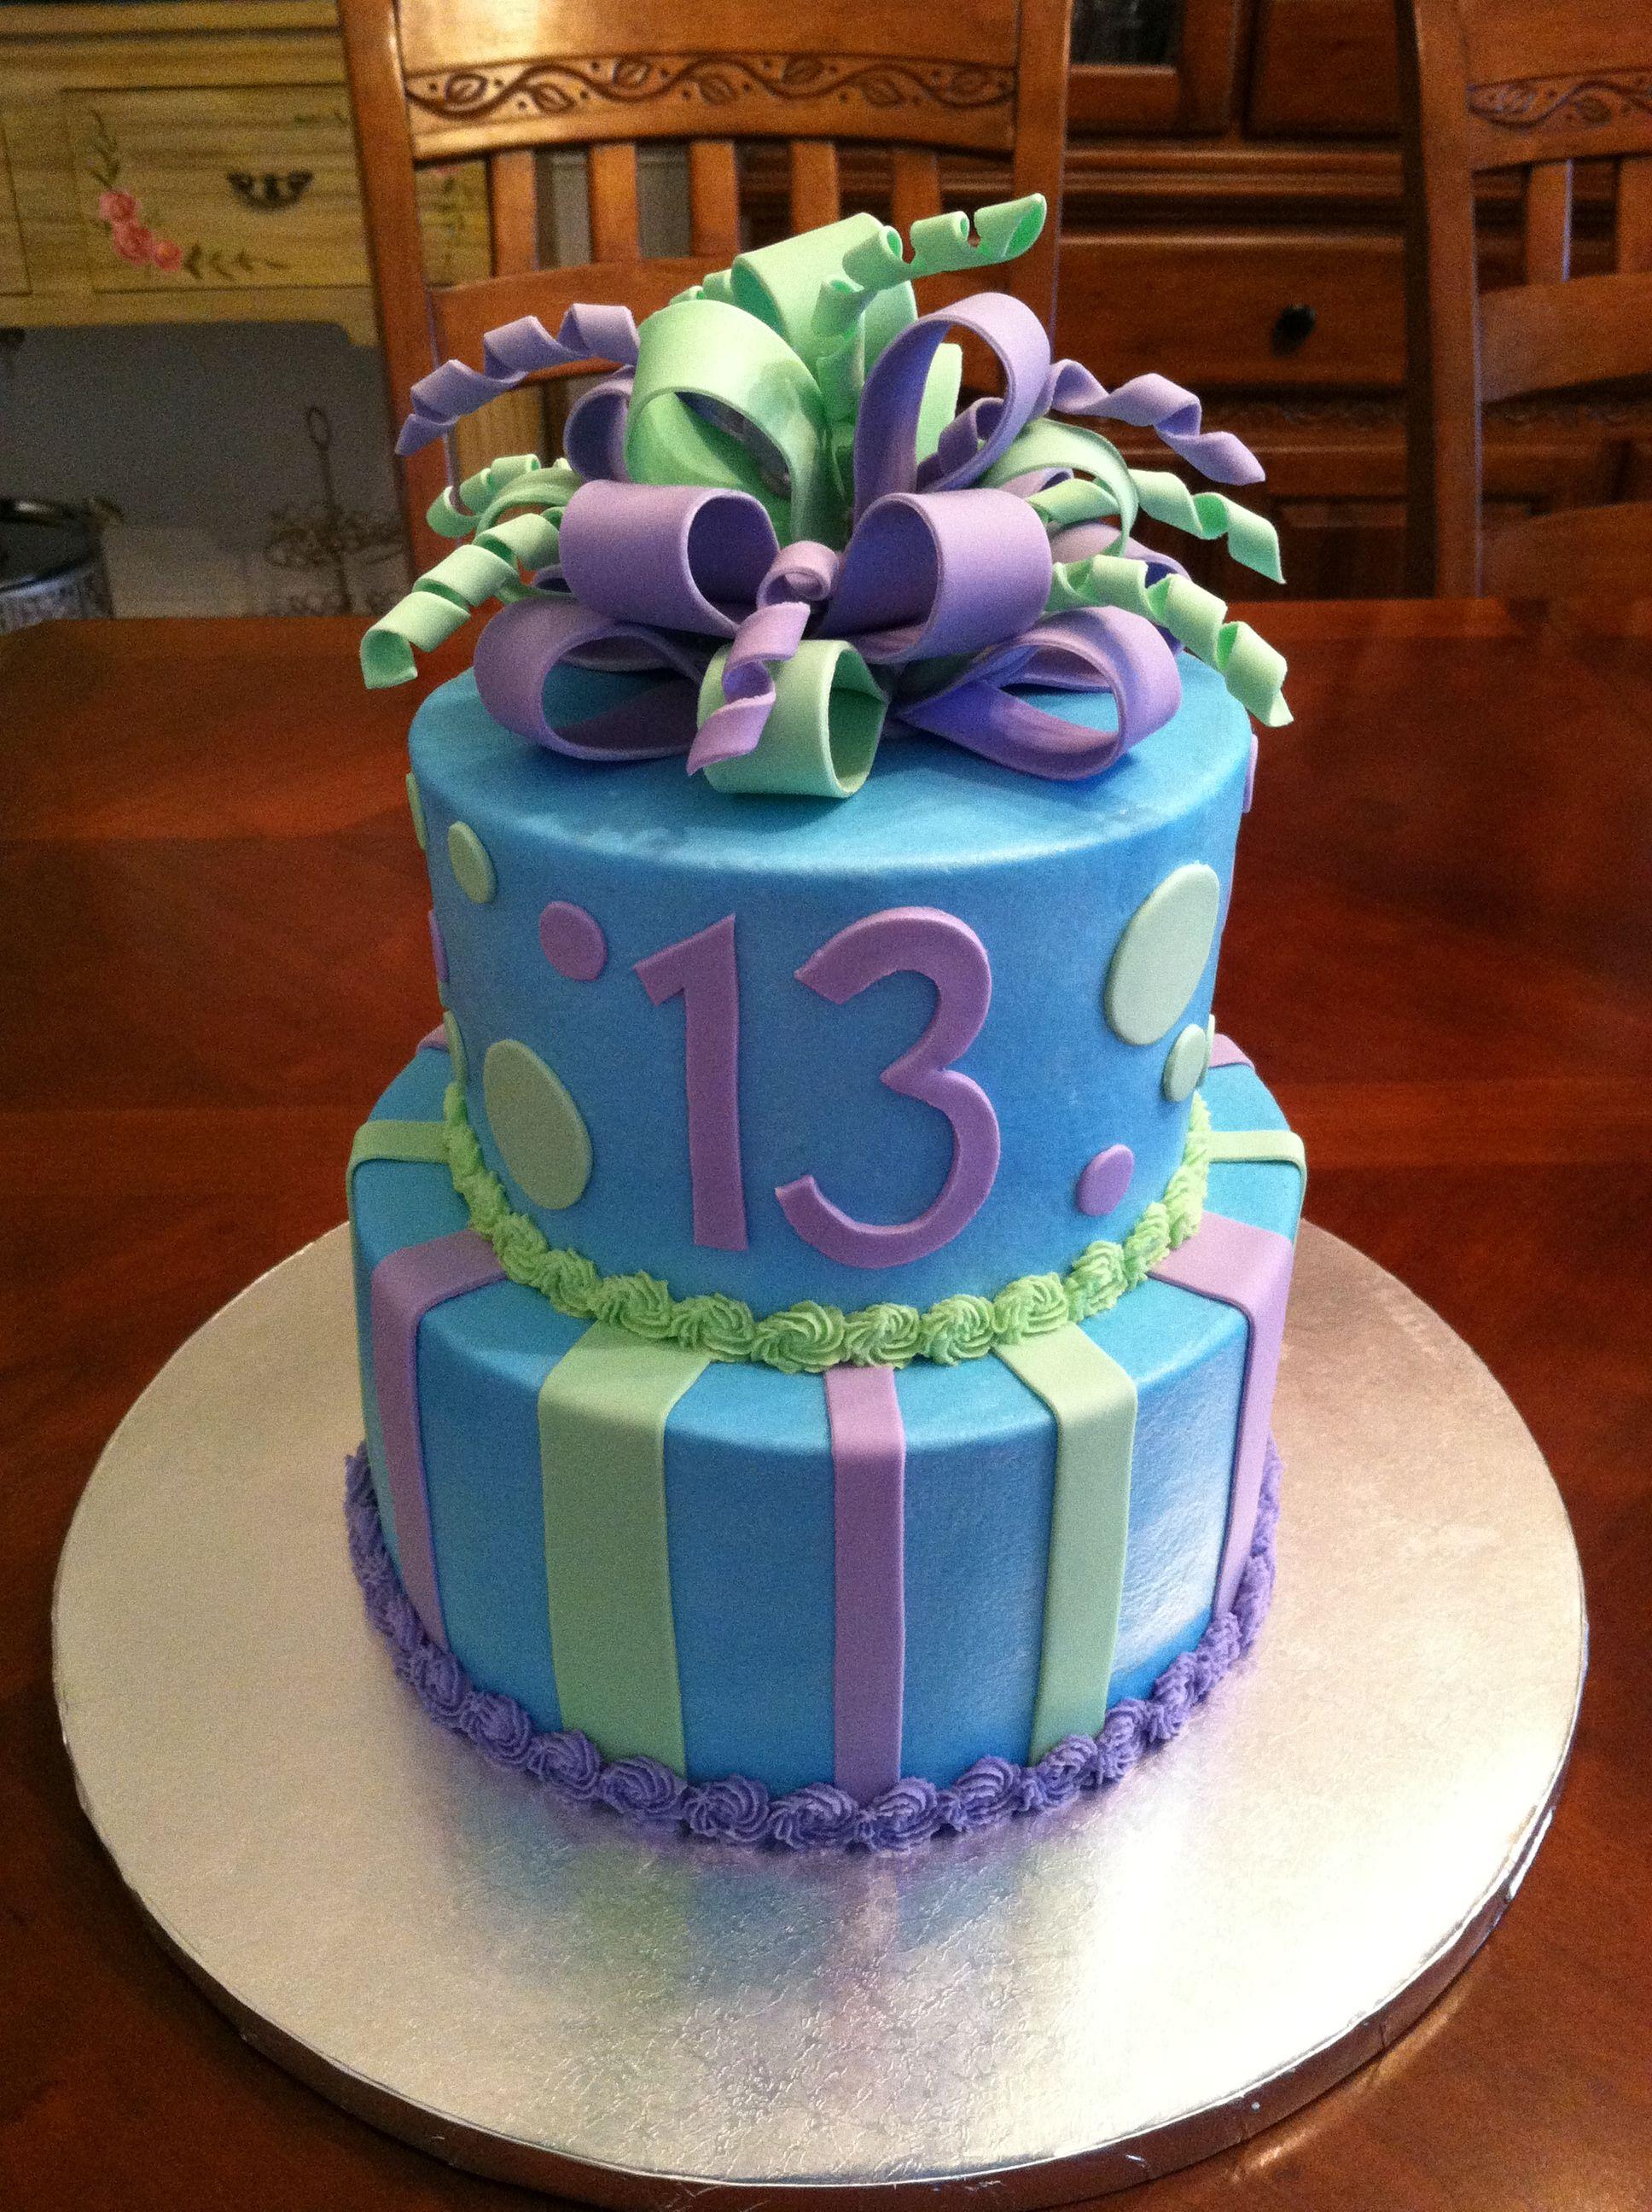 13th birthday gift ideas for niece